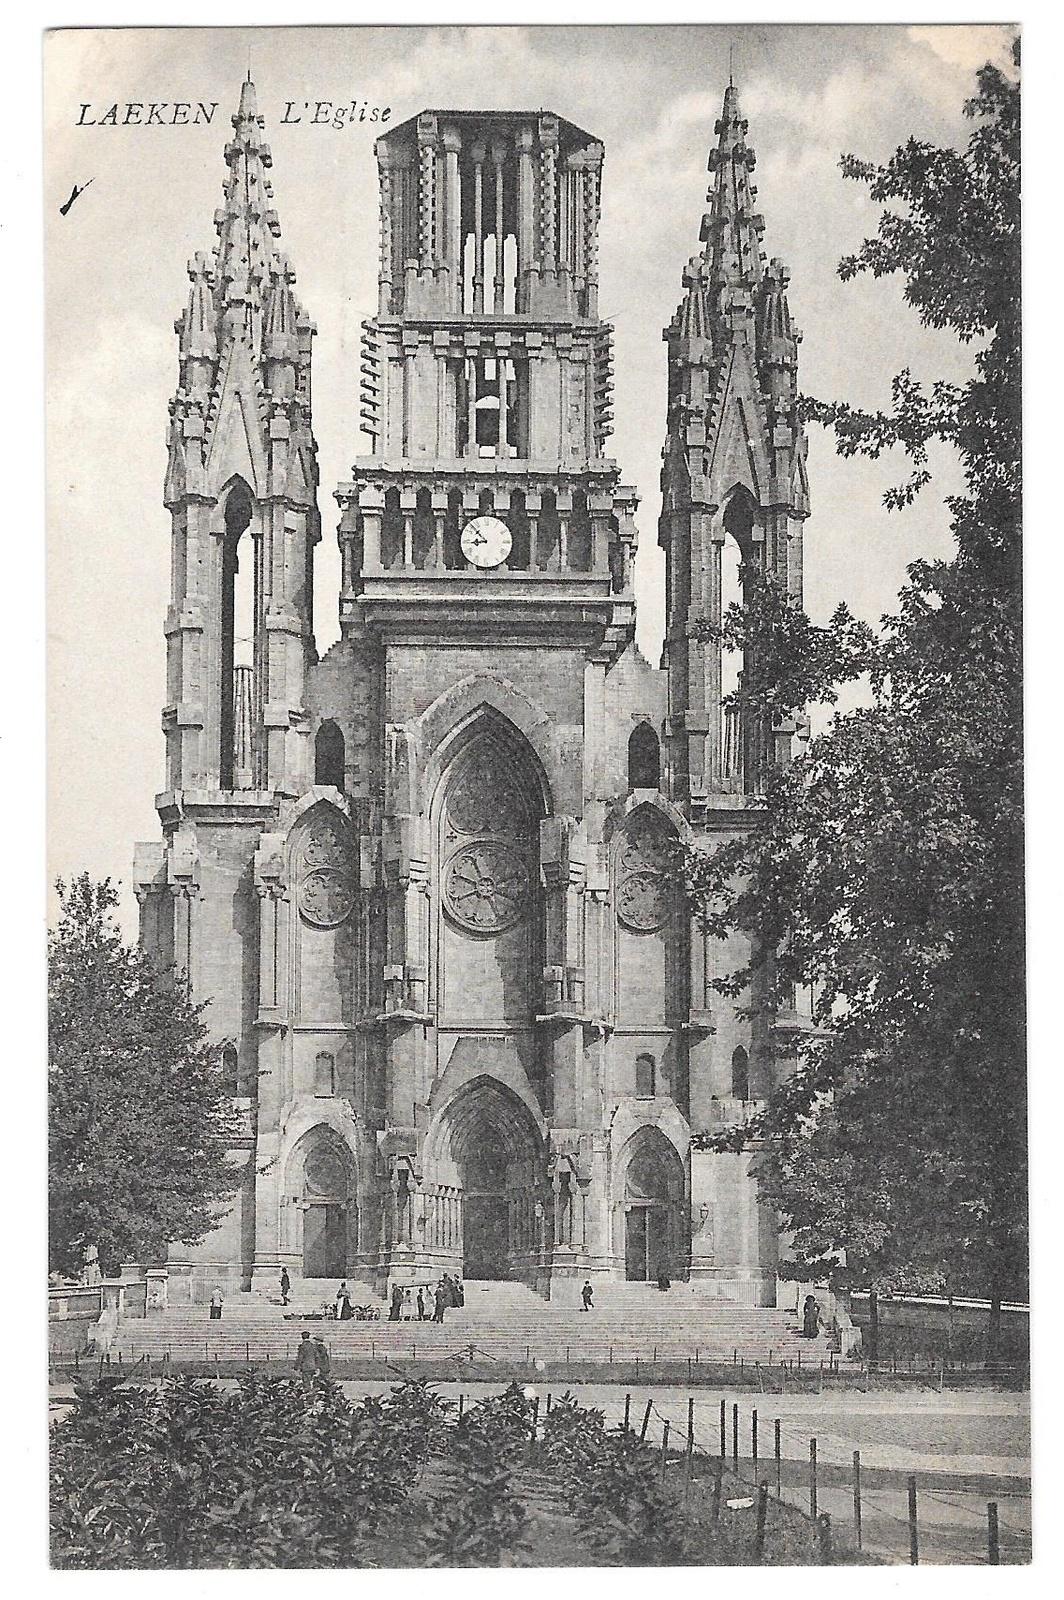 97 br 4950 315 belgium laeken l eglise church